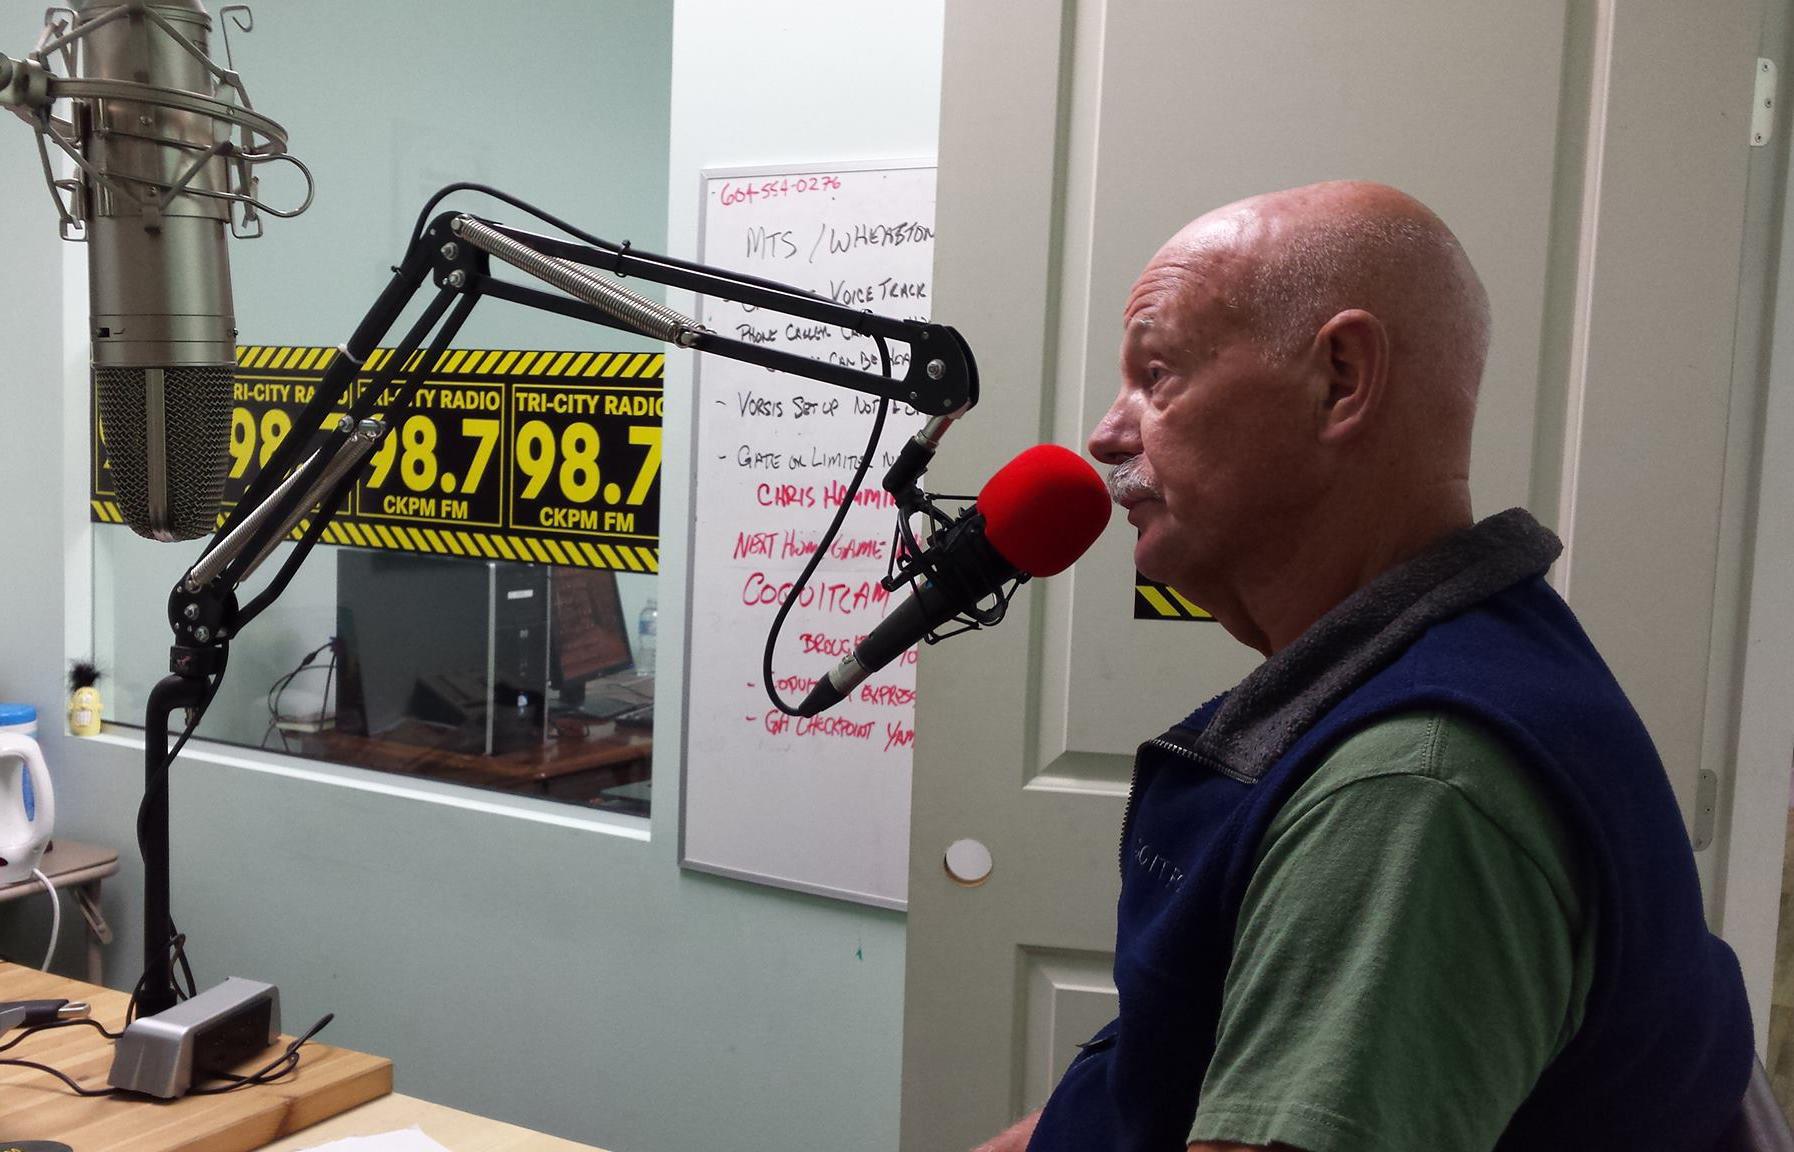 Chris being interviewed on radio in 2015.